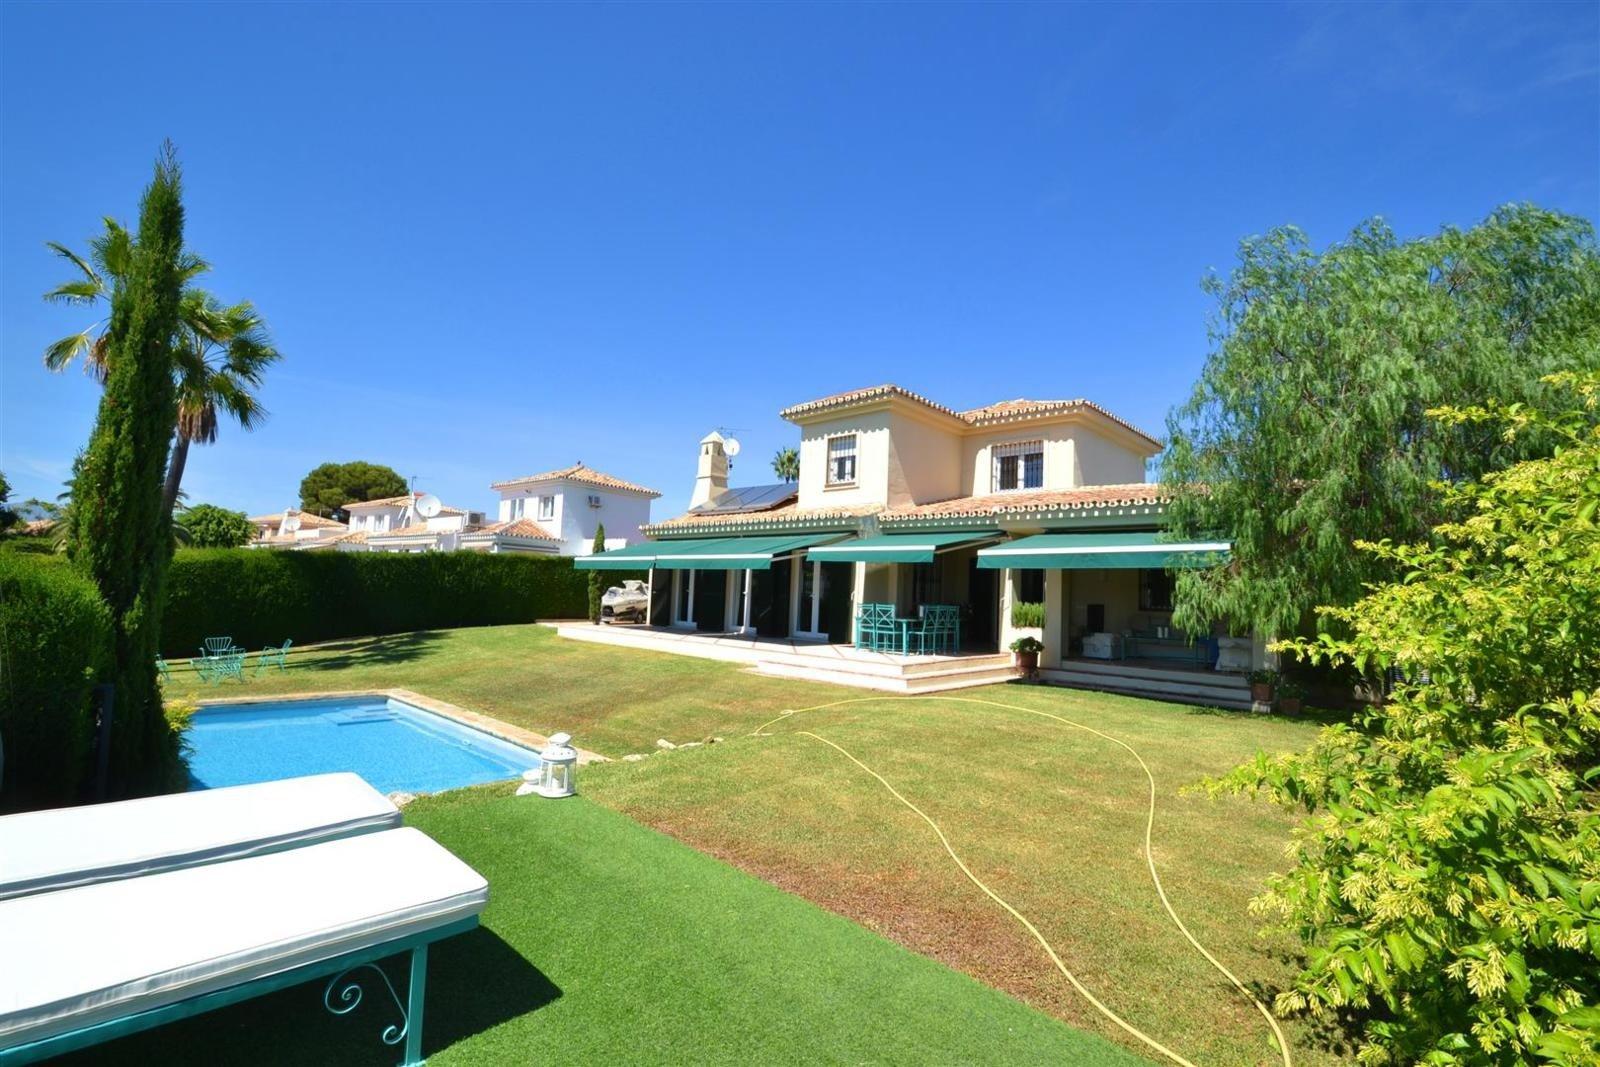 Villas for Sale in Calahonda